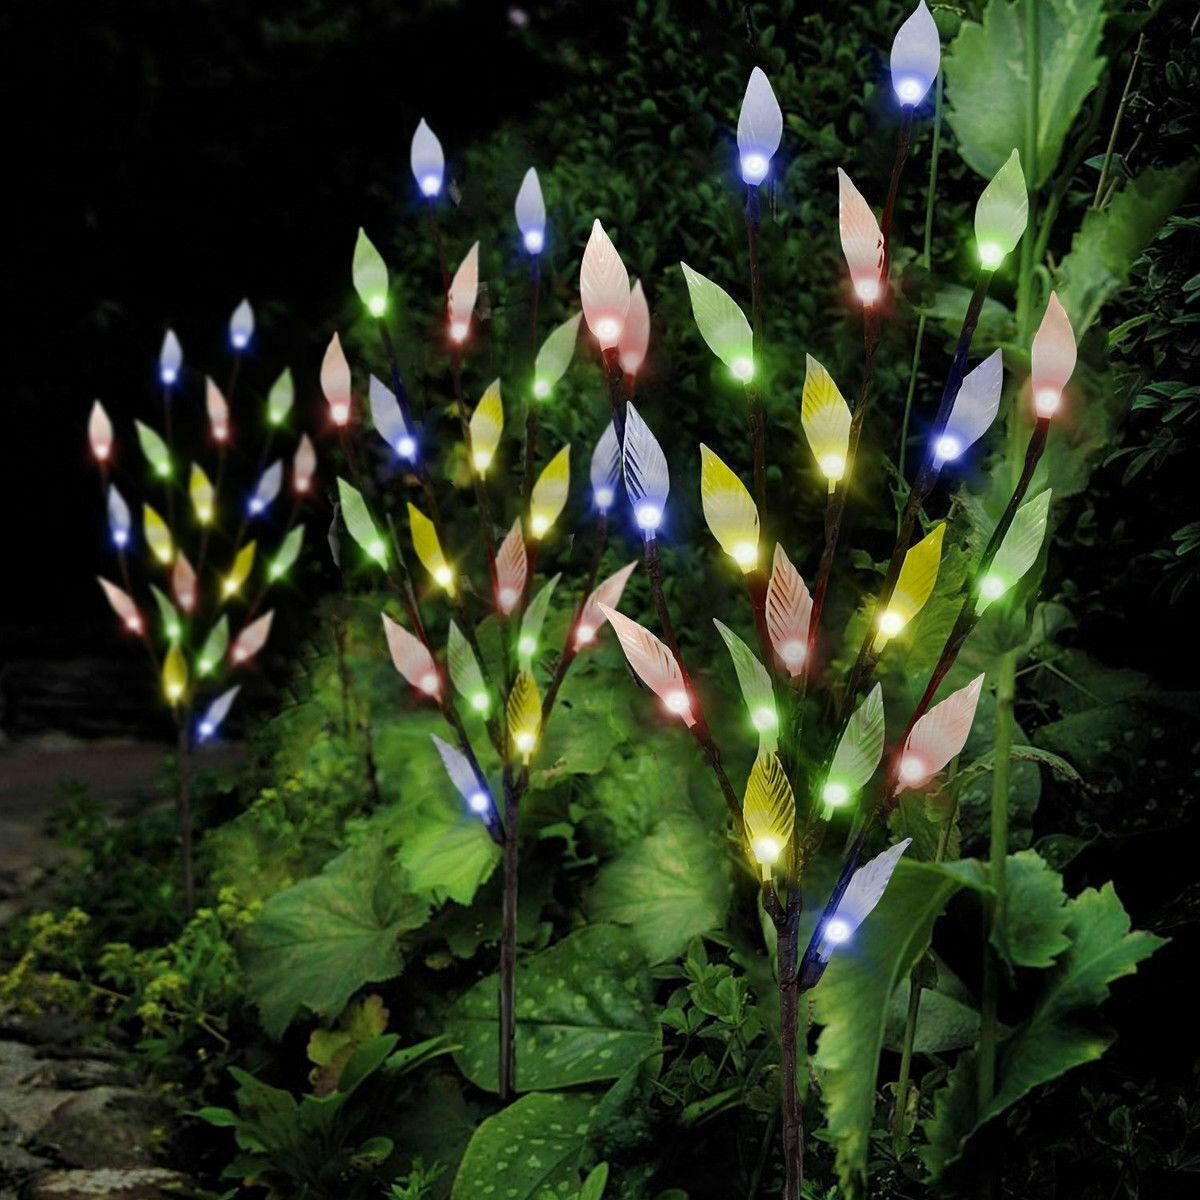 3x Branch Tree Leaf Flower Light Outdoor Garden Lawn Solar Powered 60 LED Multi